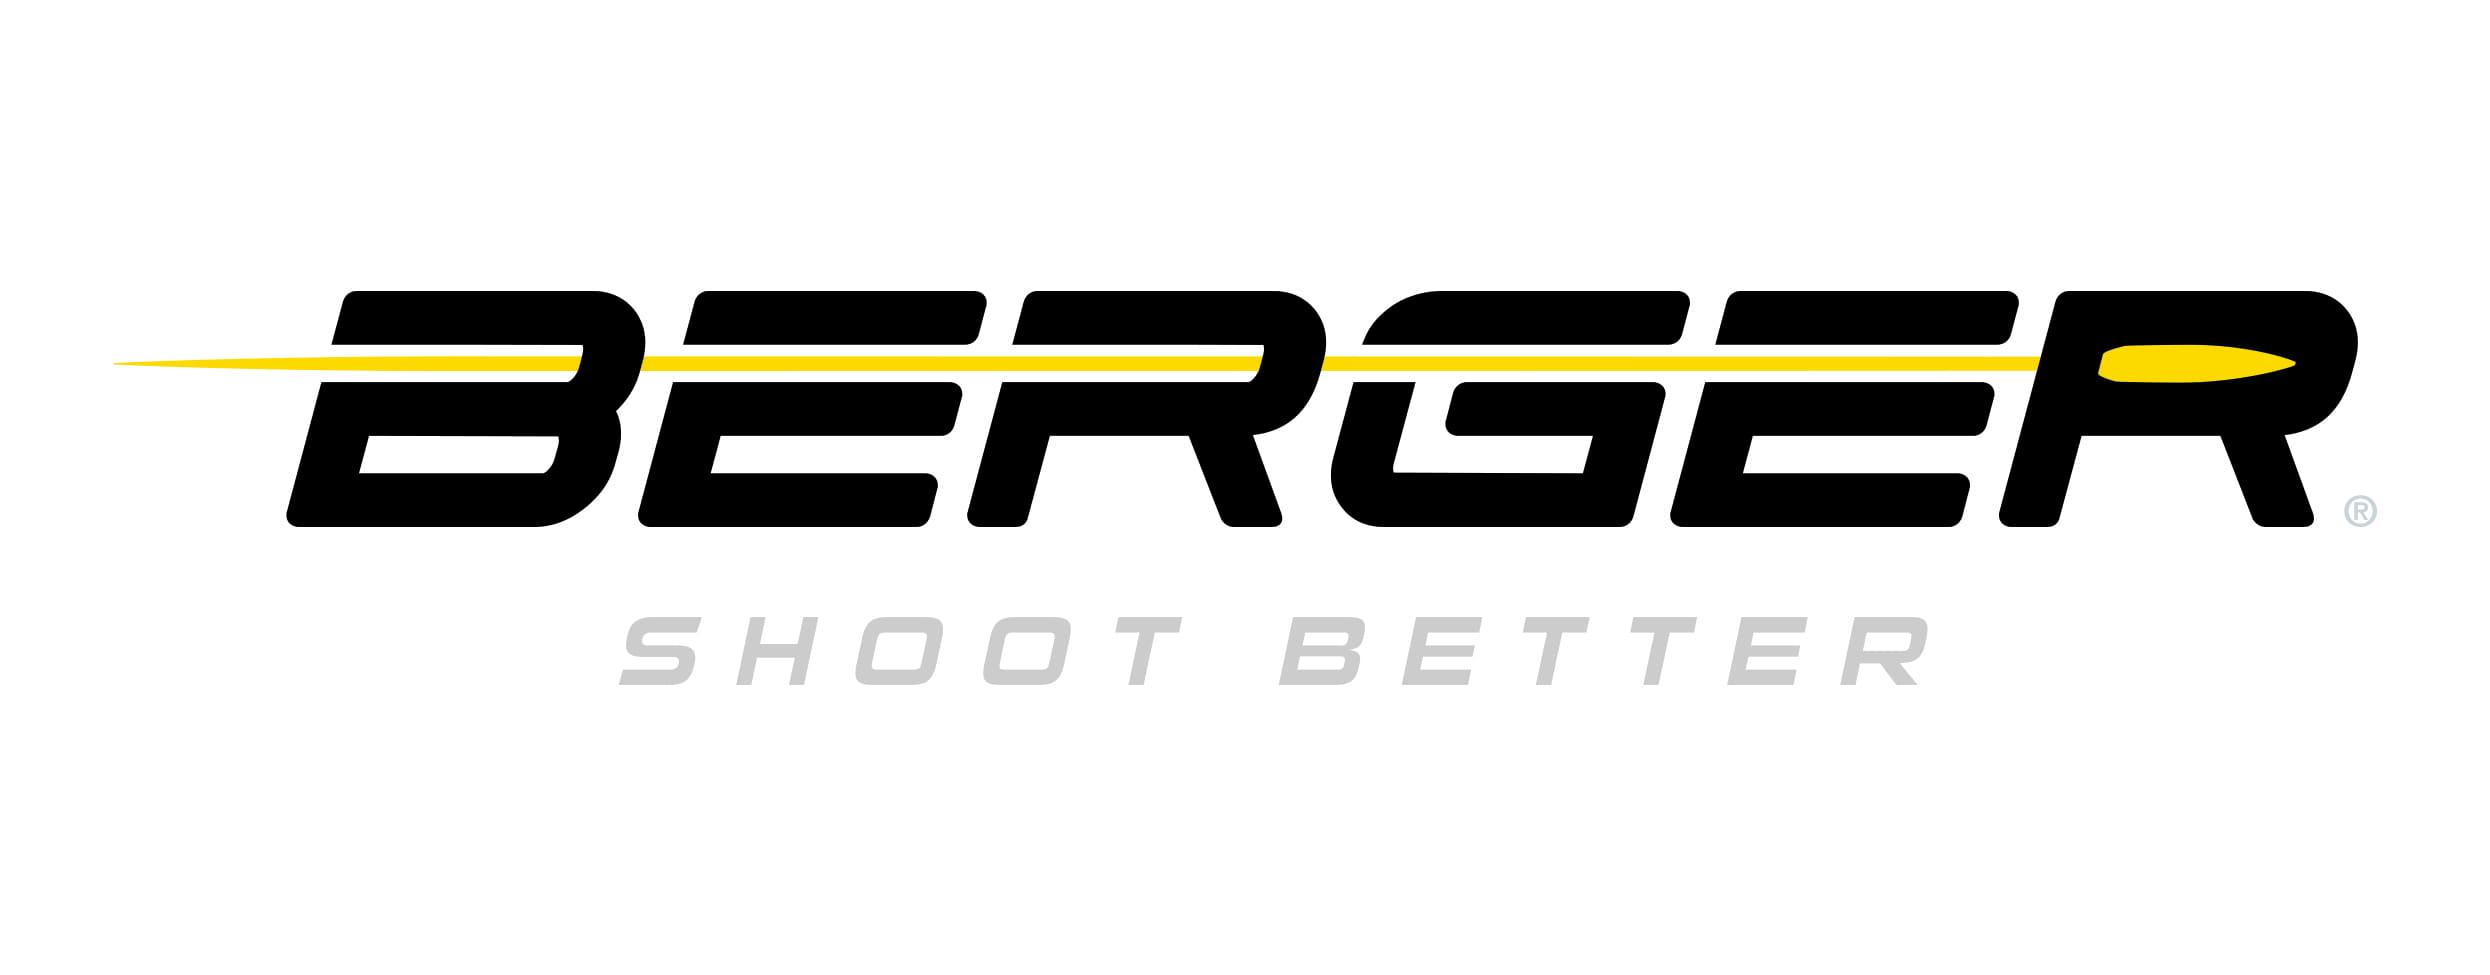 Berger Bullets - Armeria Bersaglio Mobile